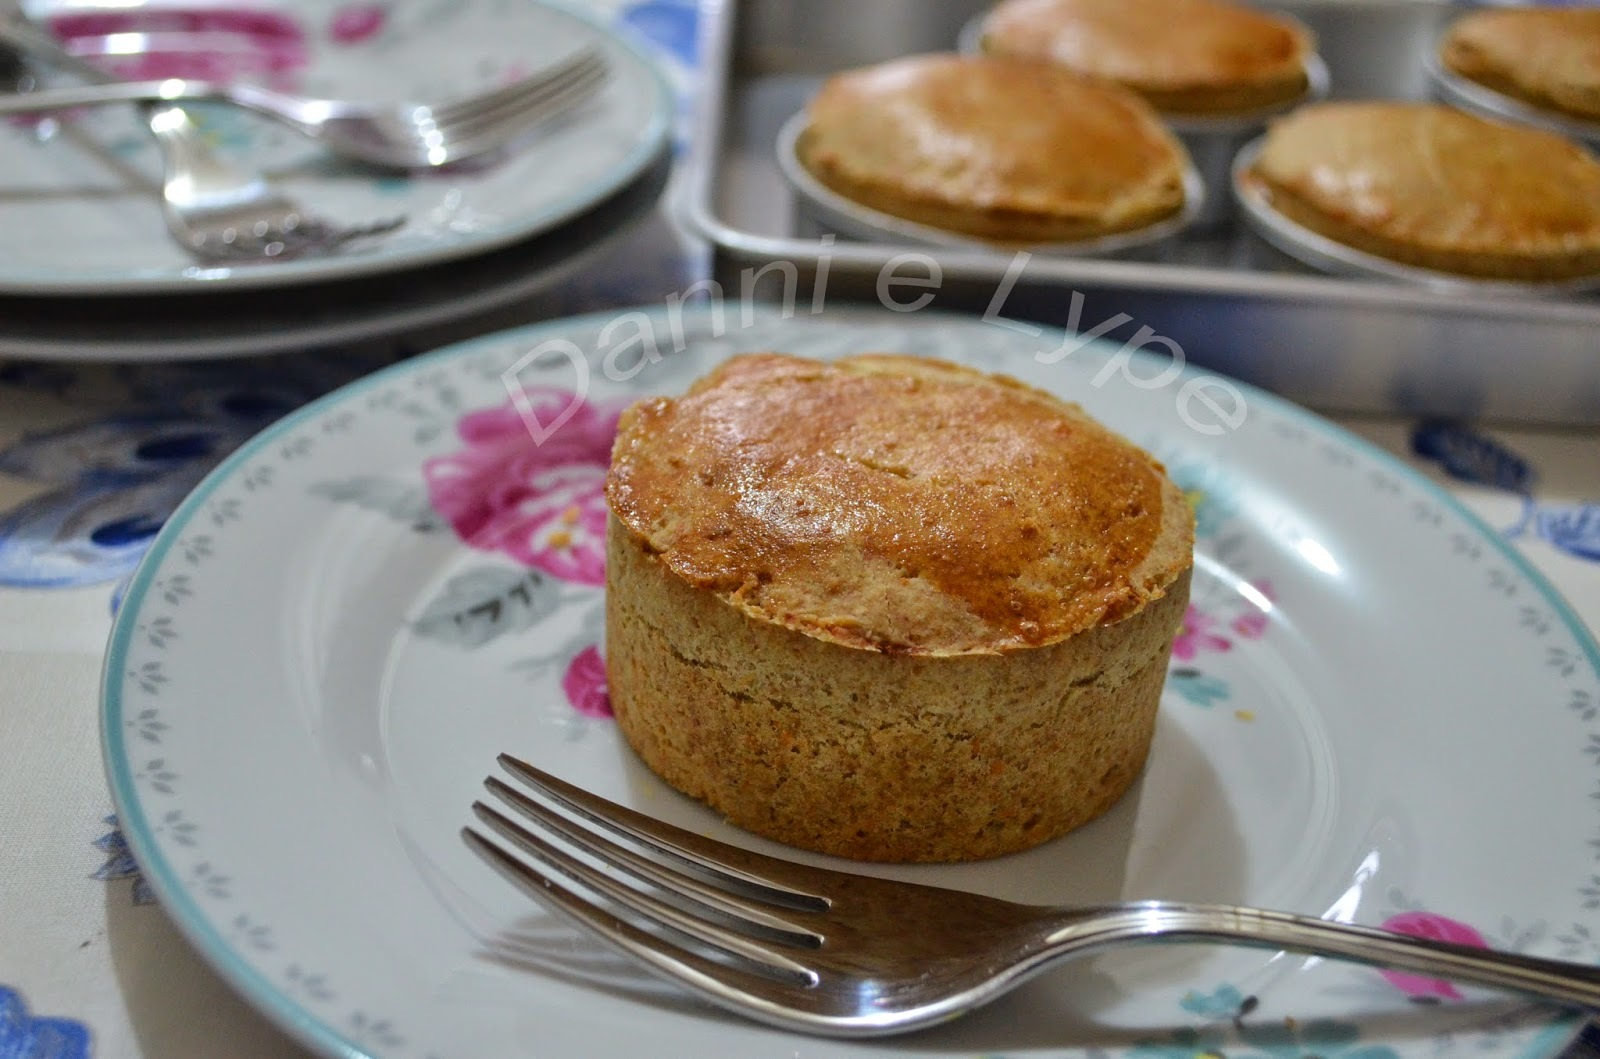 de alvaro rodrigues culinarista pastel diplomata